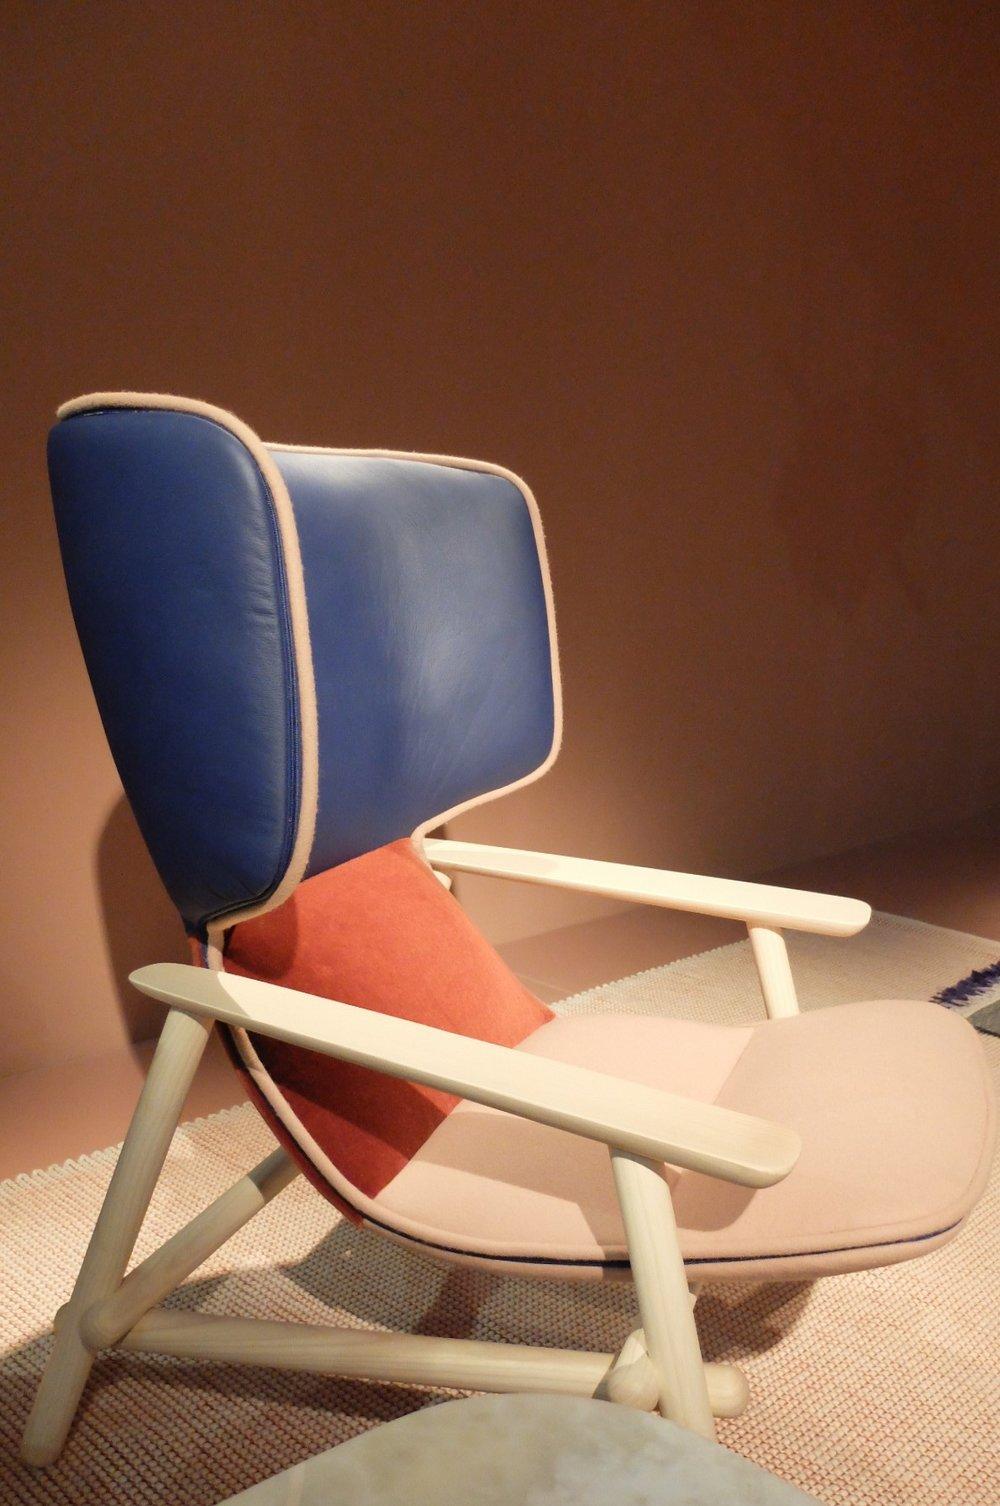 Lilo seating by Patricia Urquiola. MOROSO